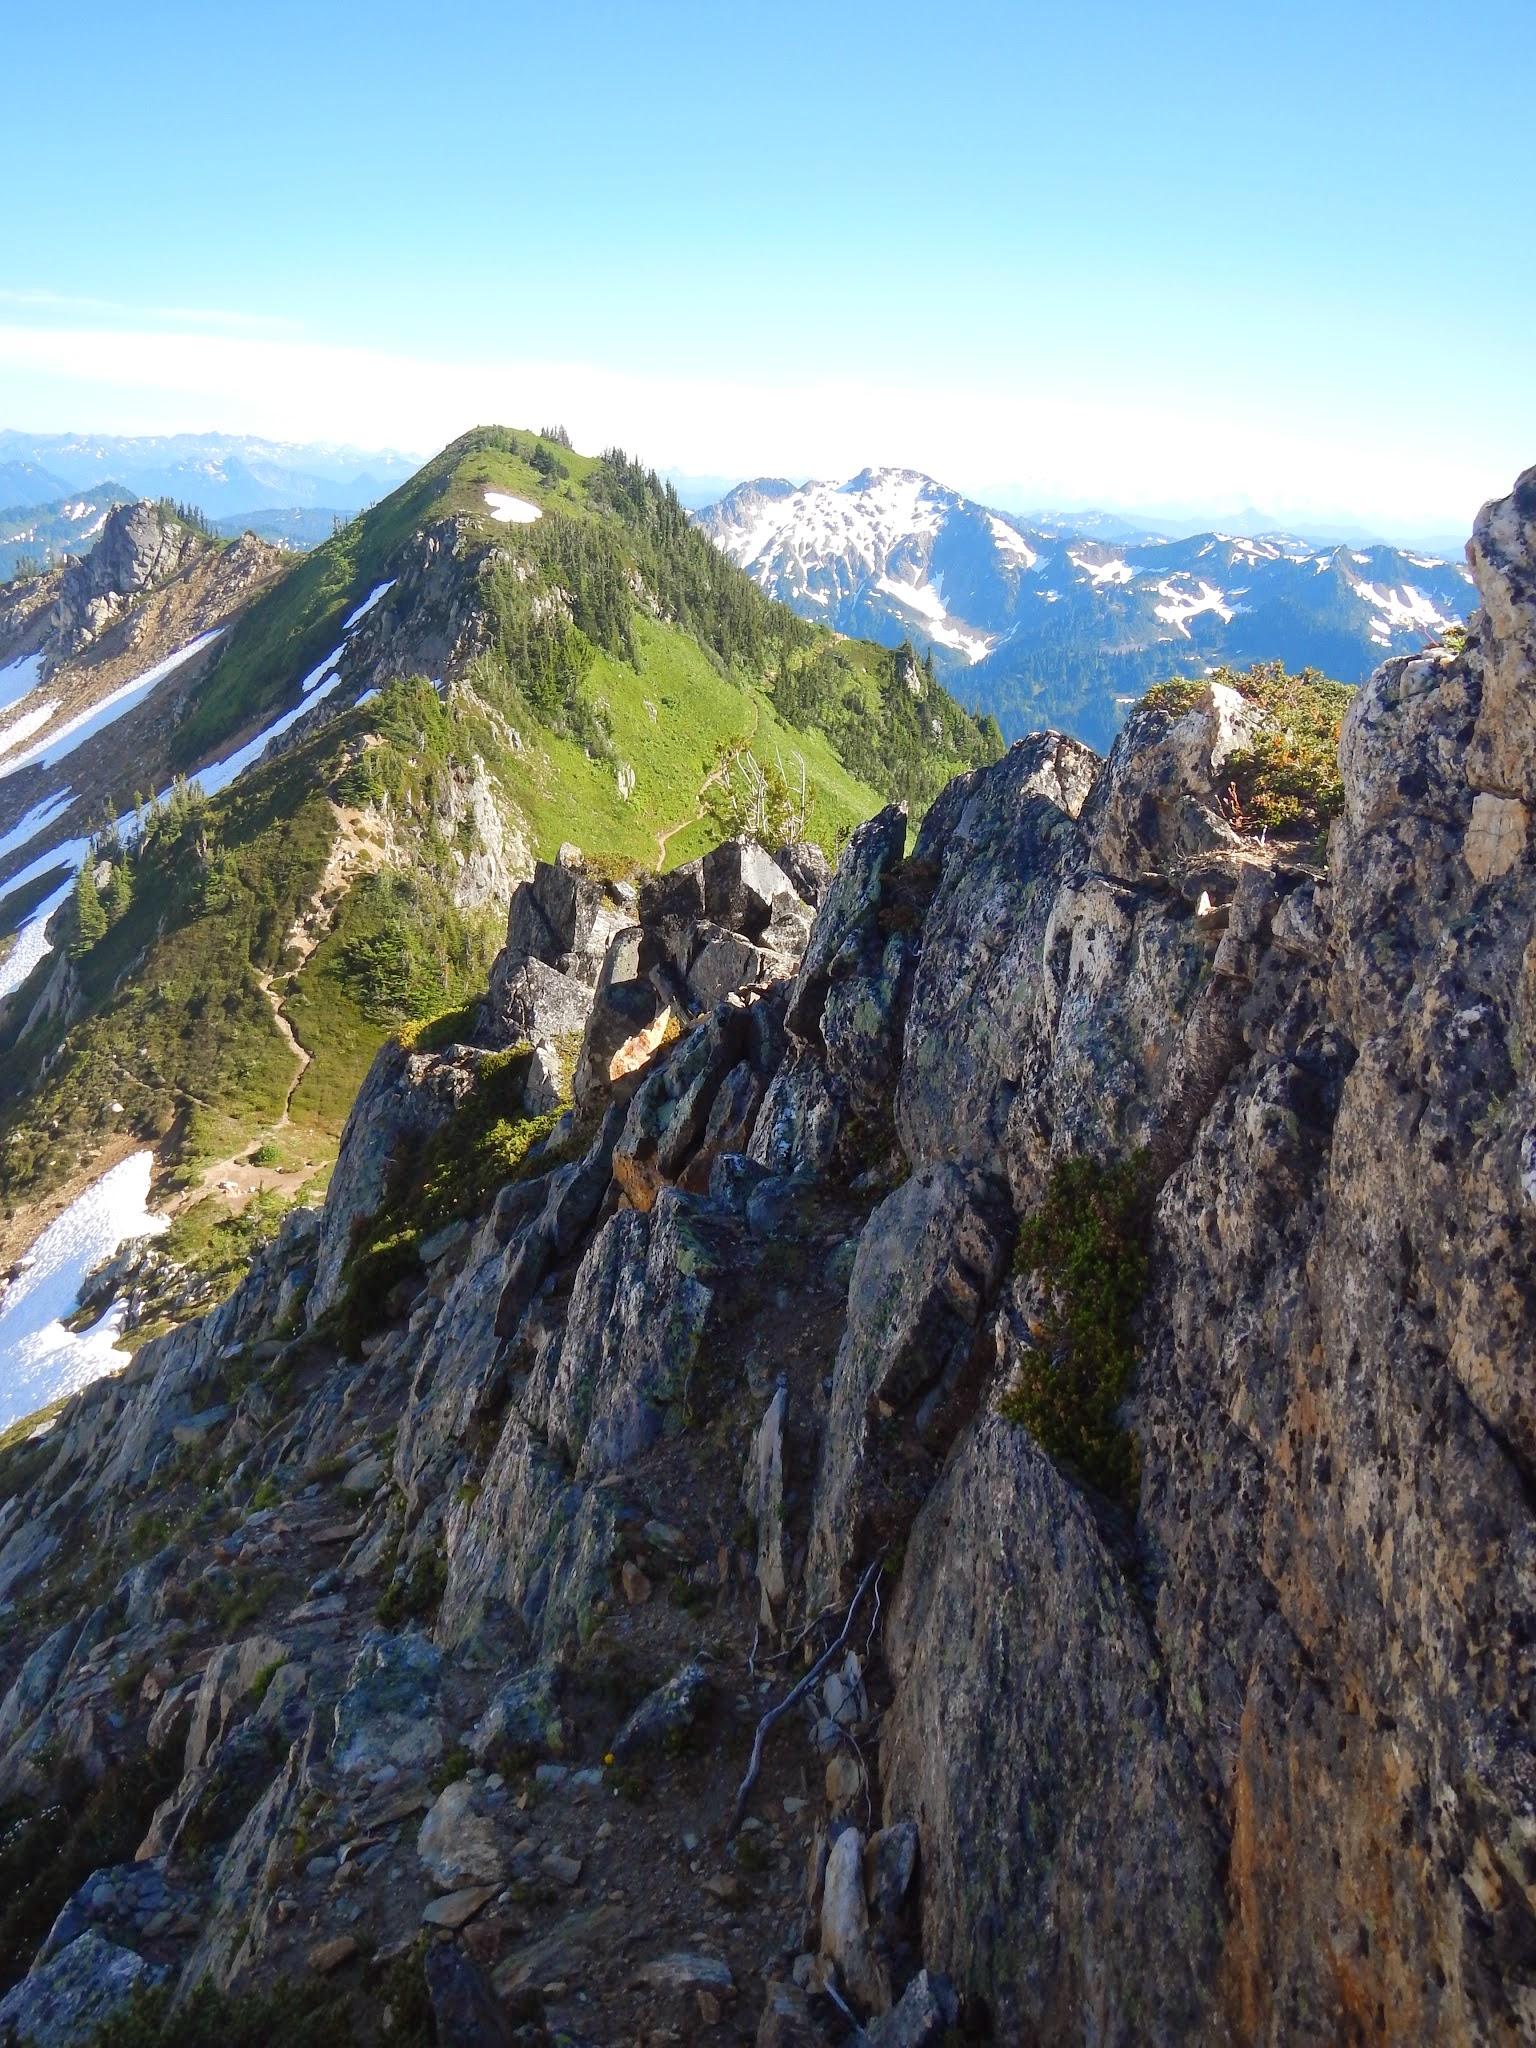 Photo: Rocky ledges lead up to Portal Peak